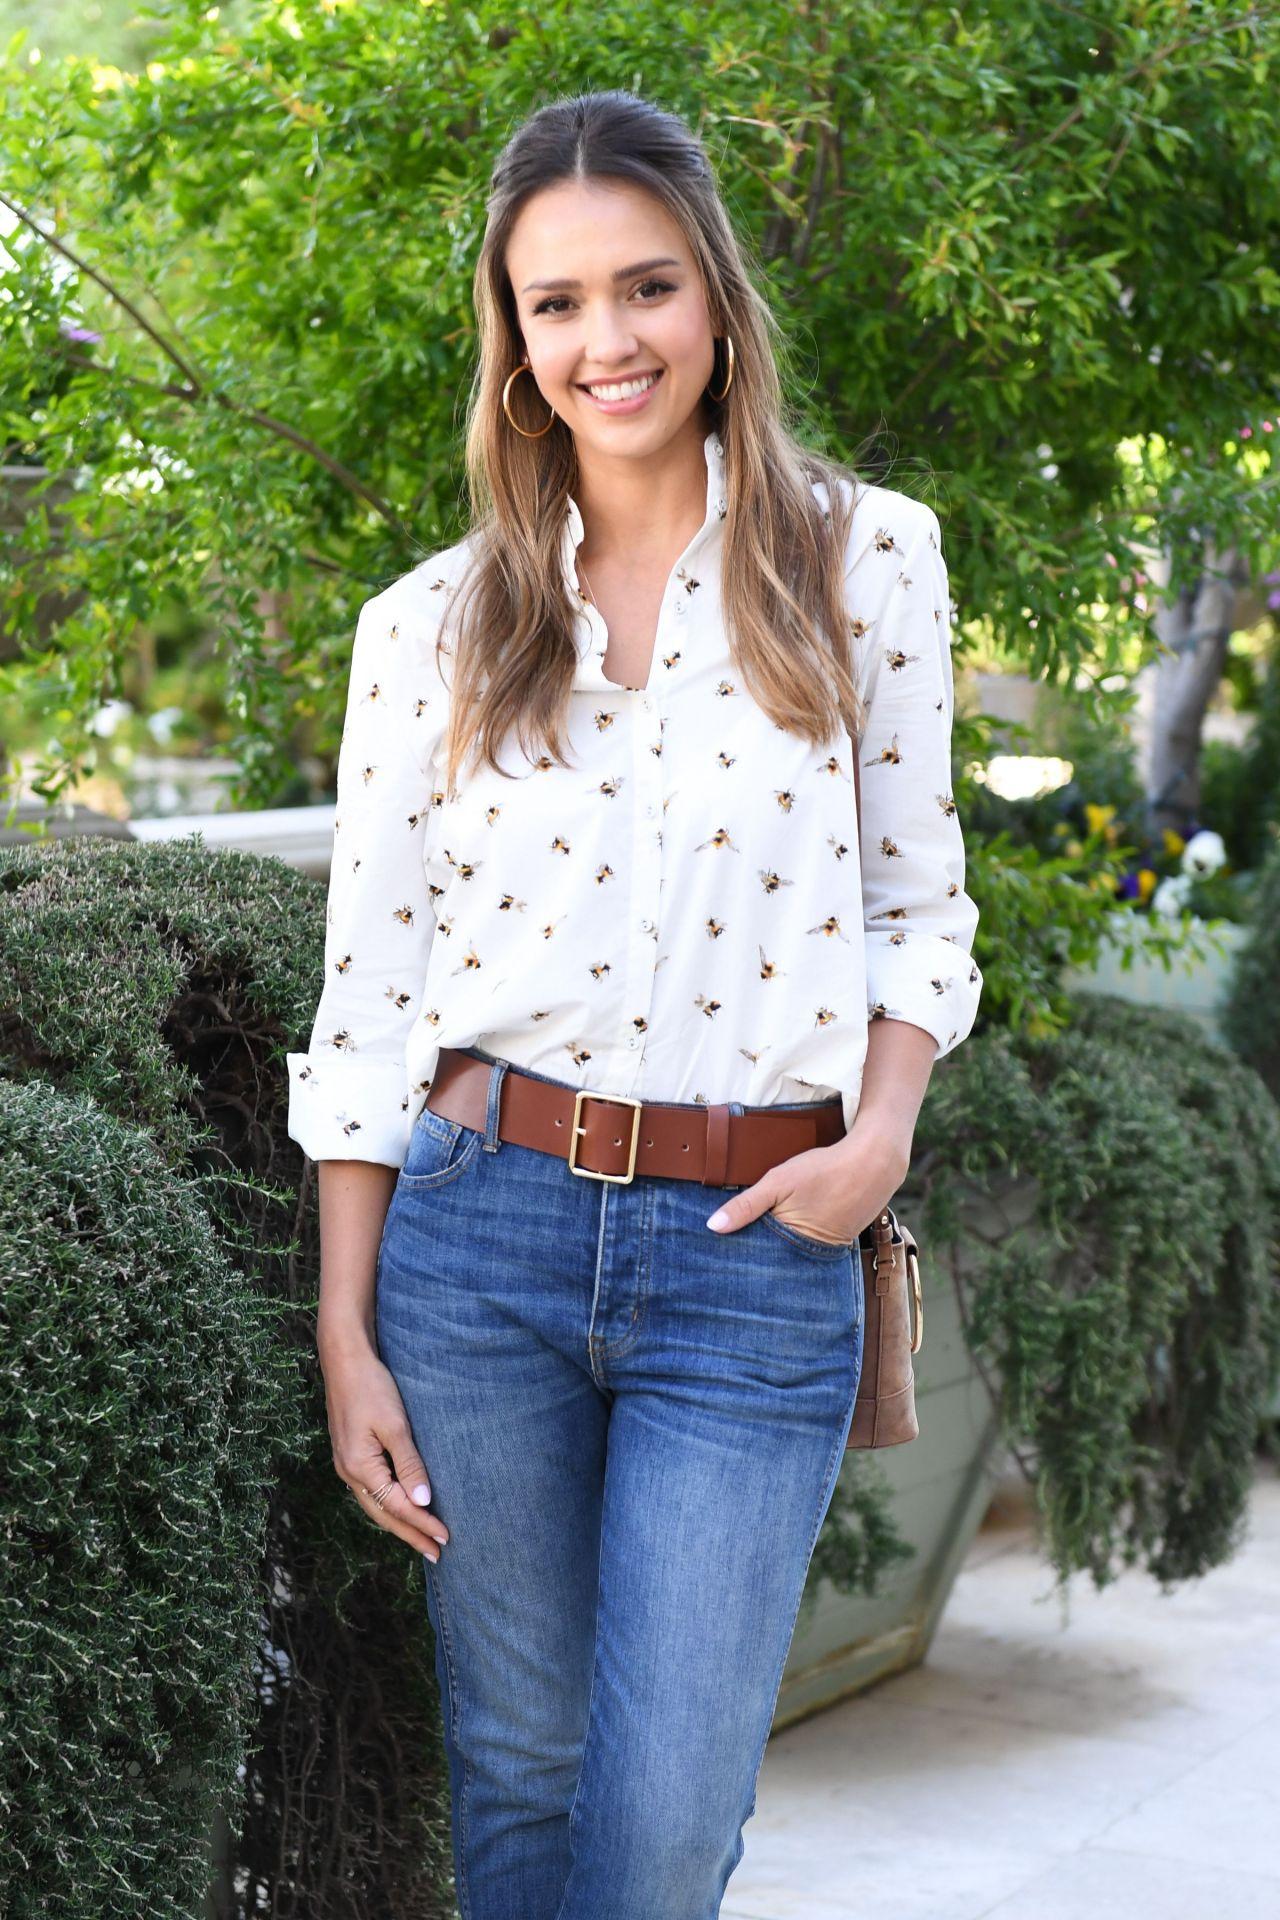 Jessica Alba at Victoria Beckham for Target Garden Party ... Jessica Alba